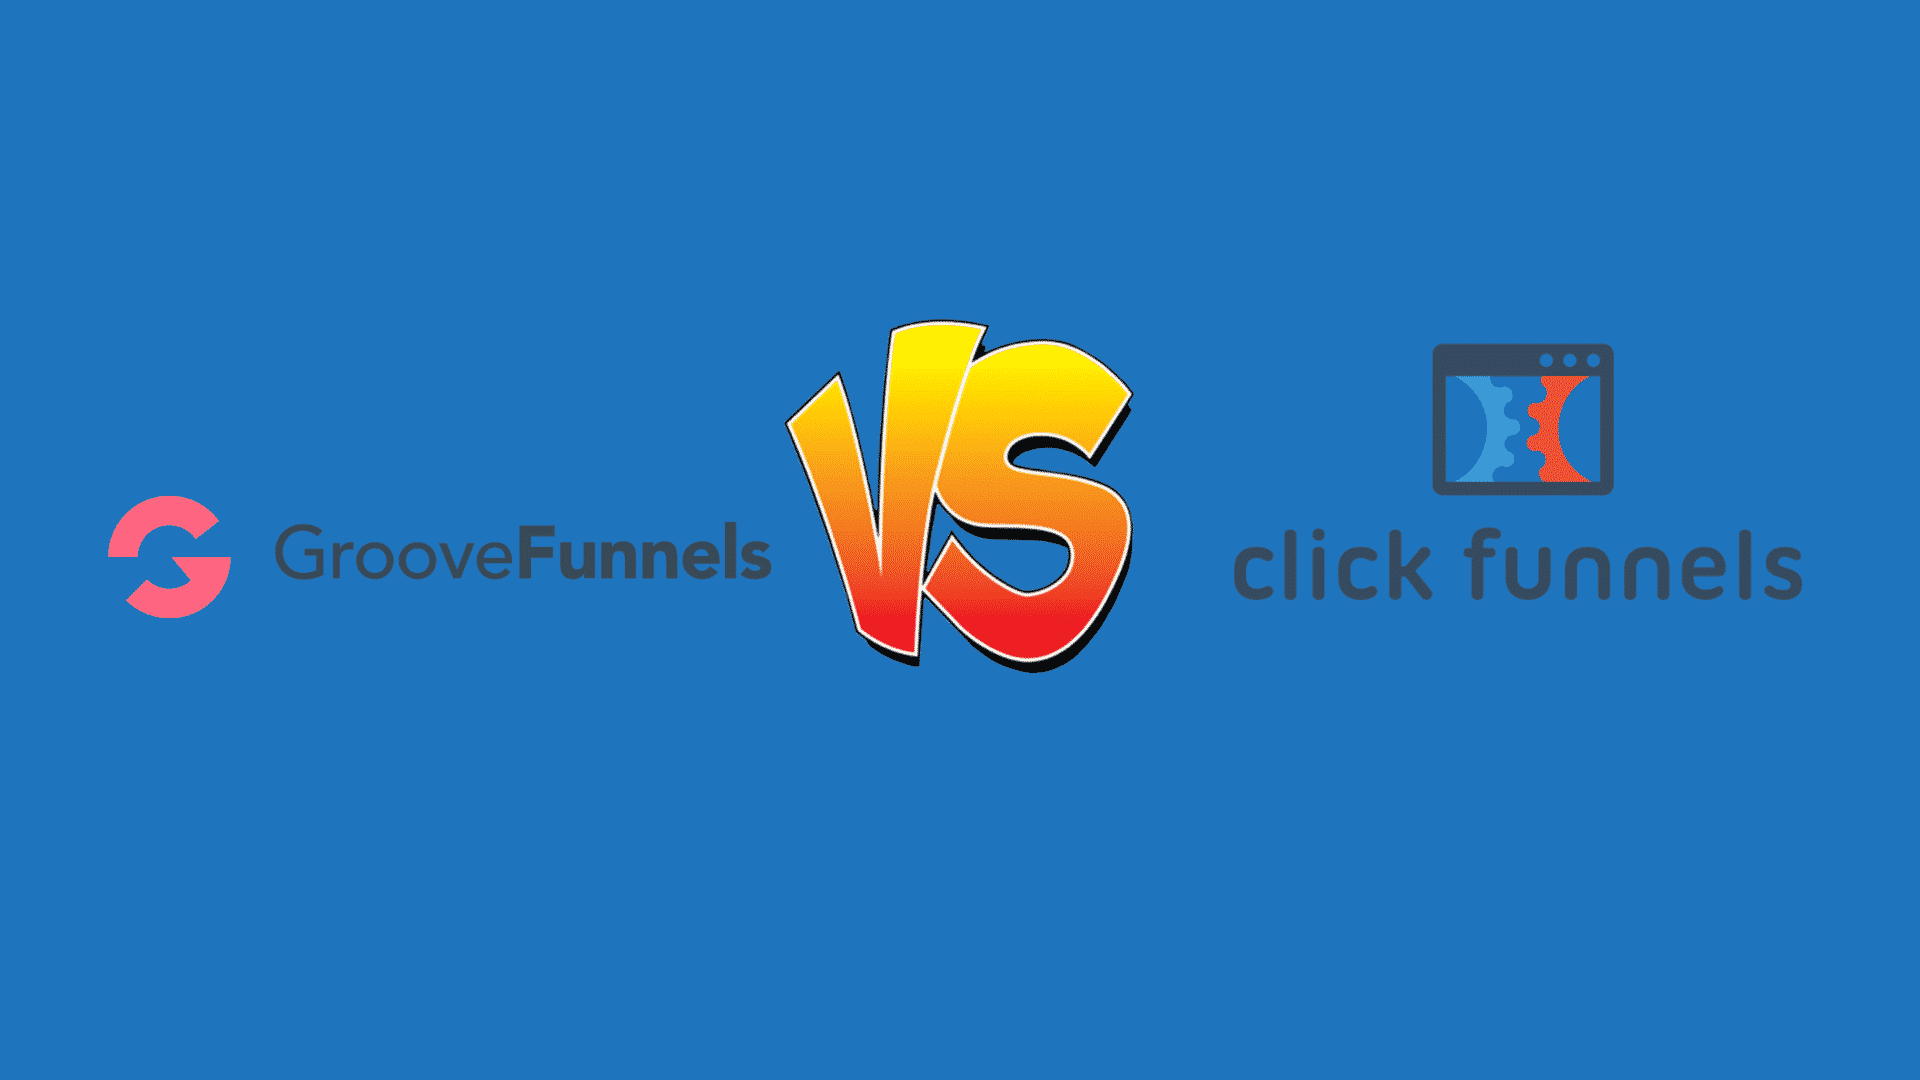 GrooveFunnels vs ClickFunnels 1